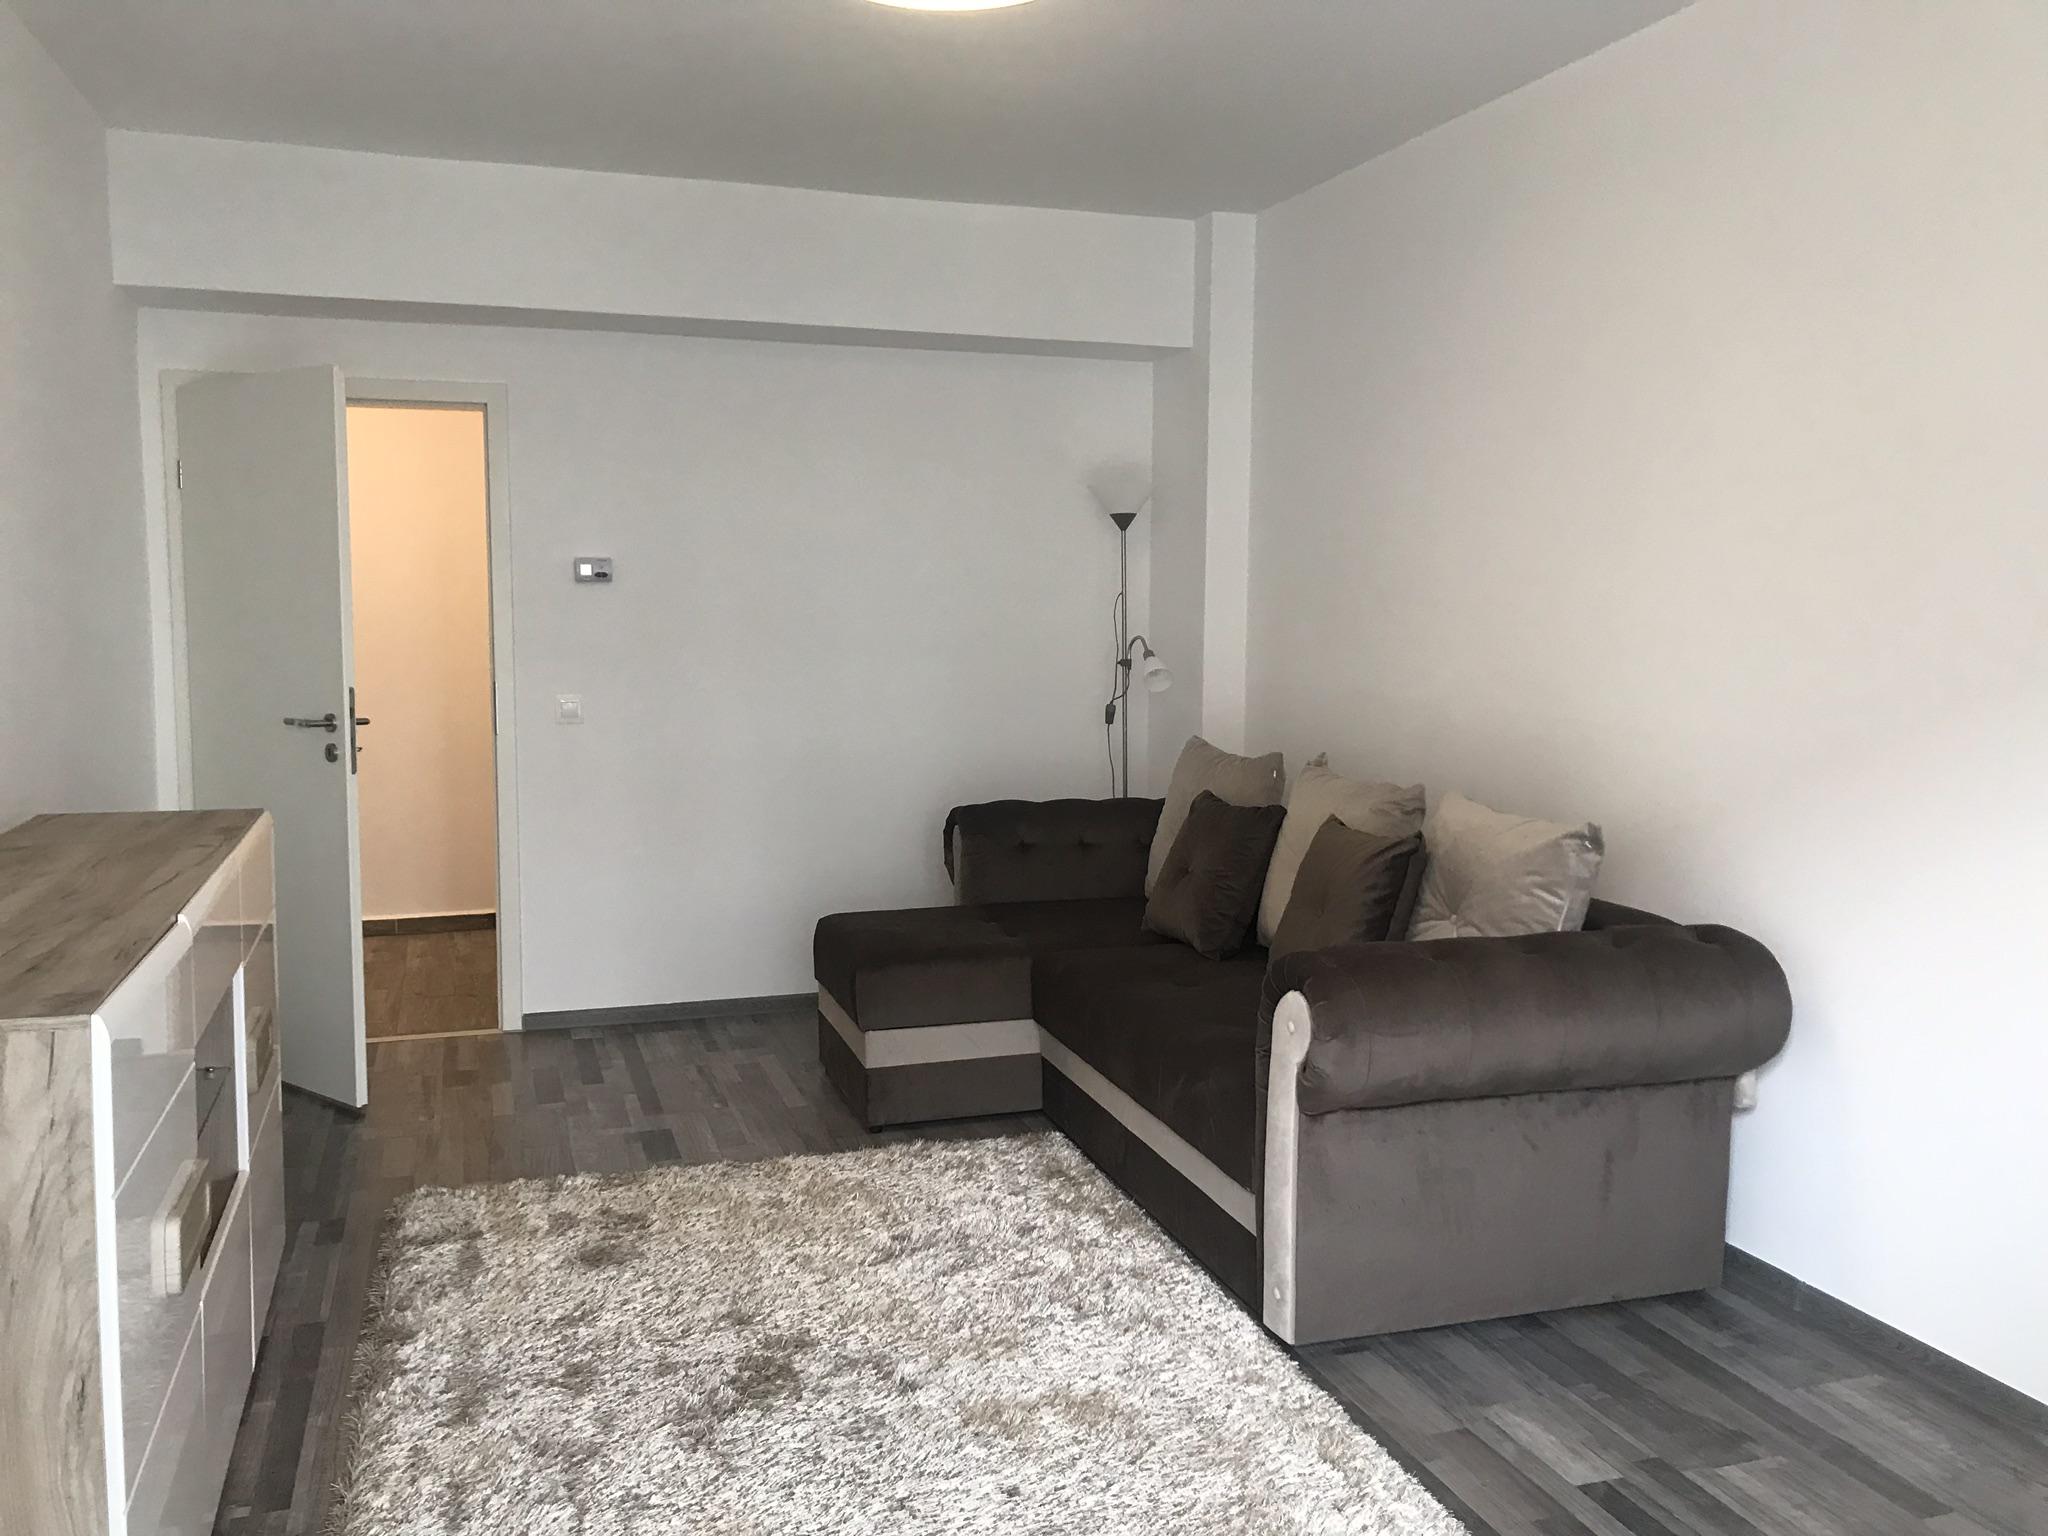 Inchiriere apartament 3 camere Maurer Residence Brasov